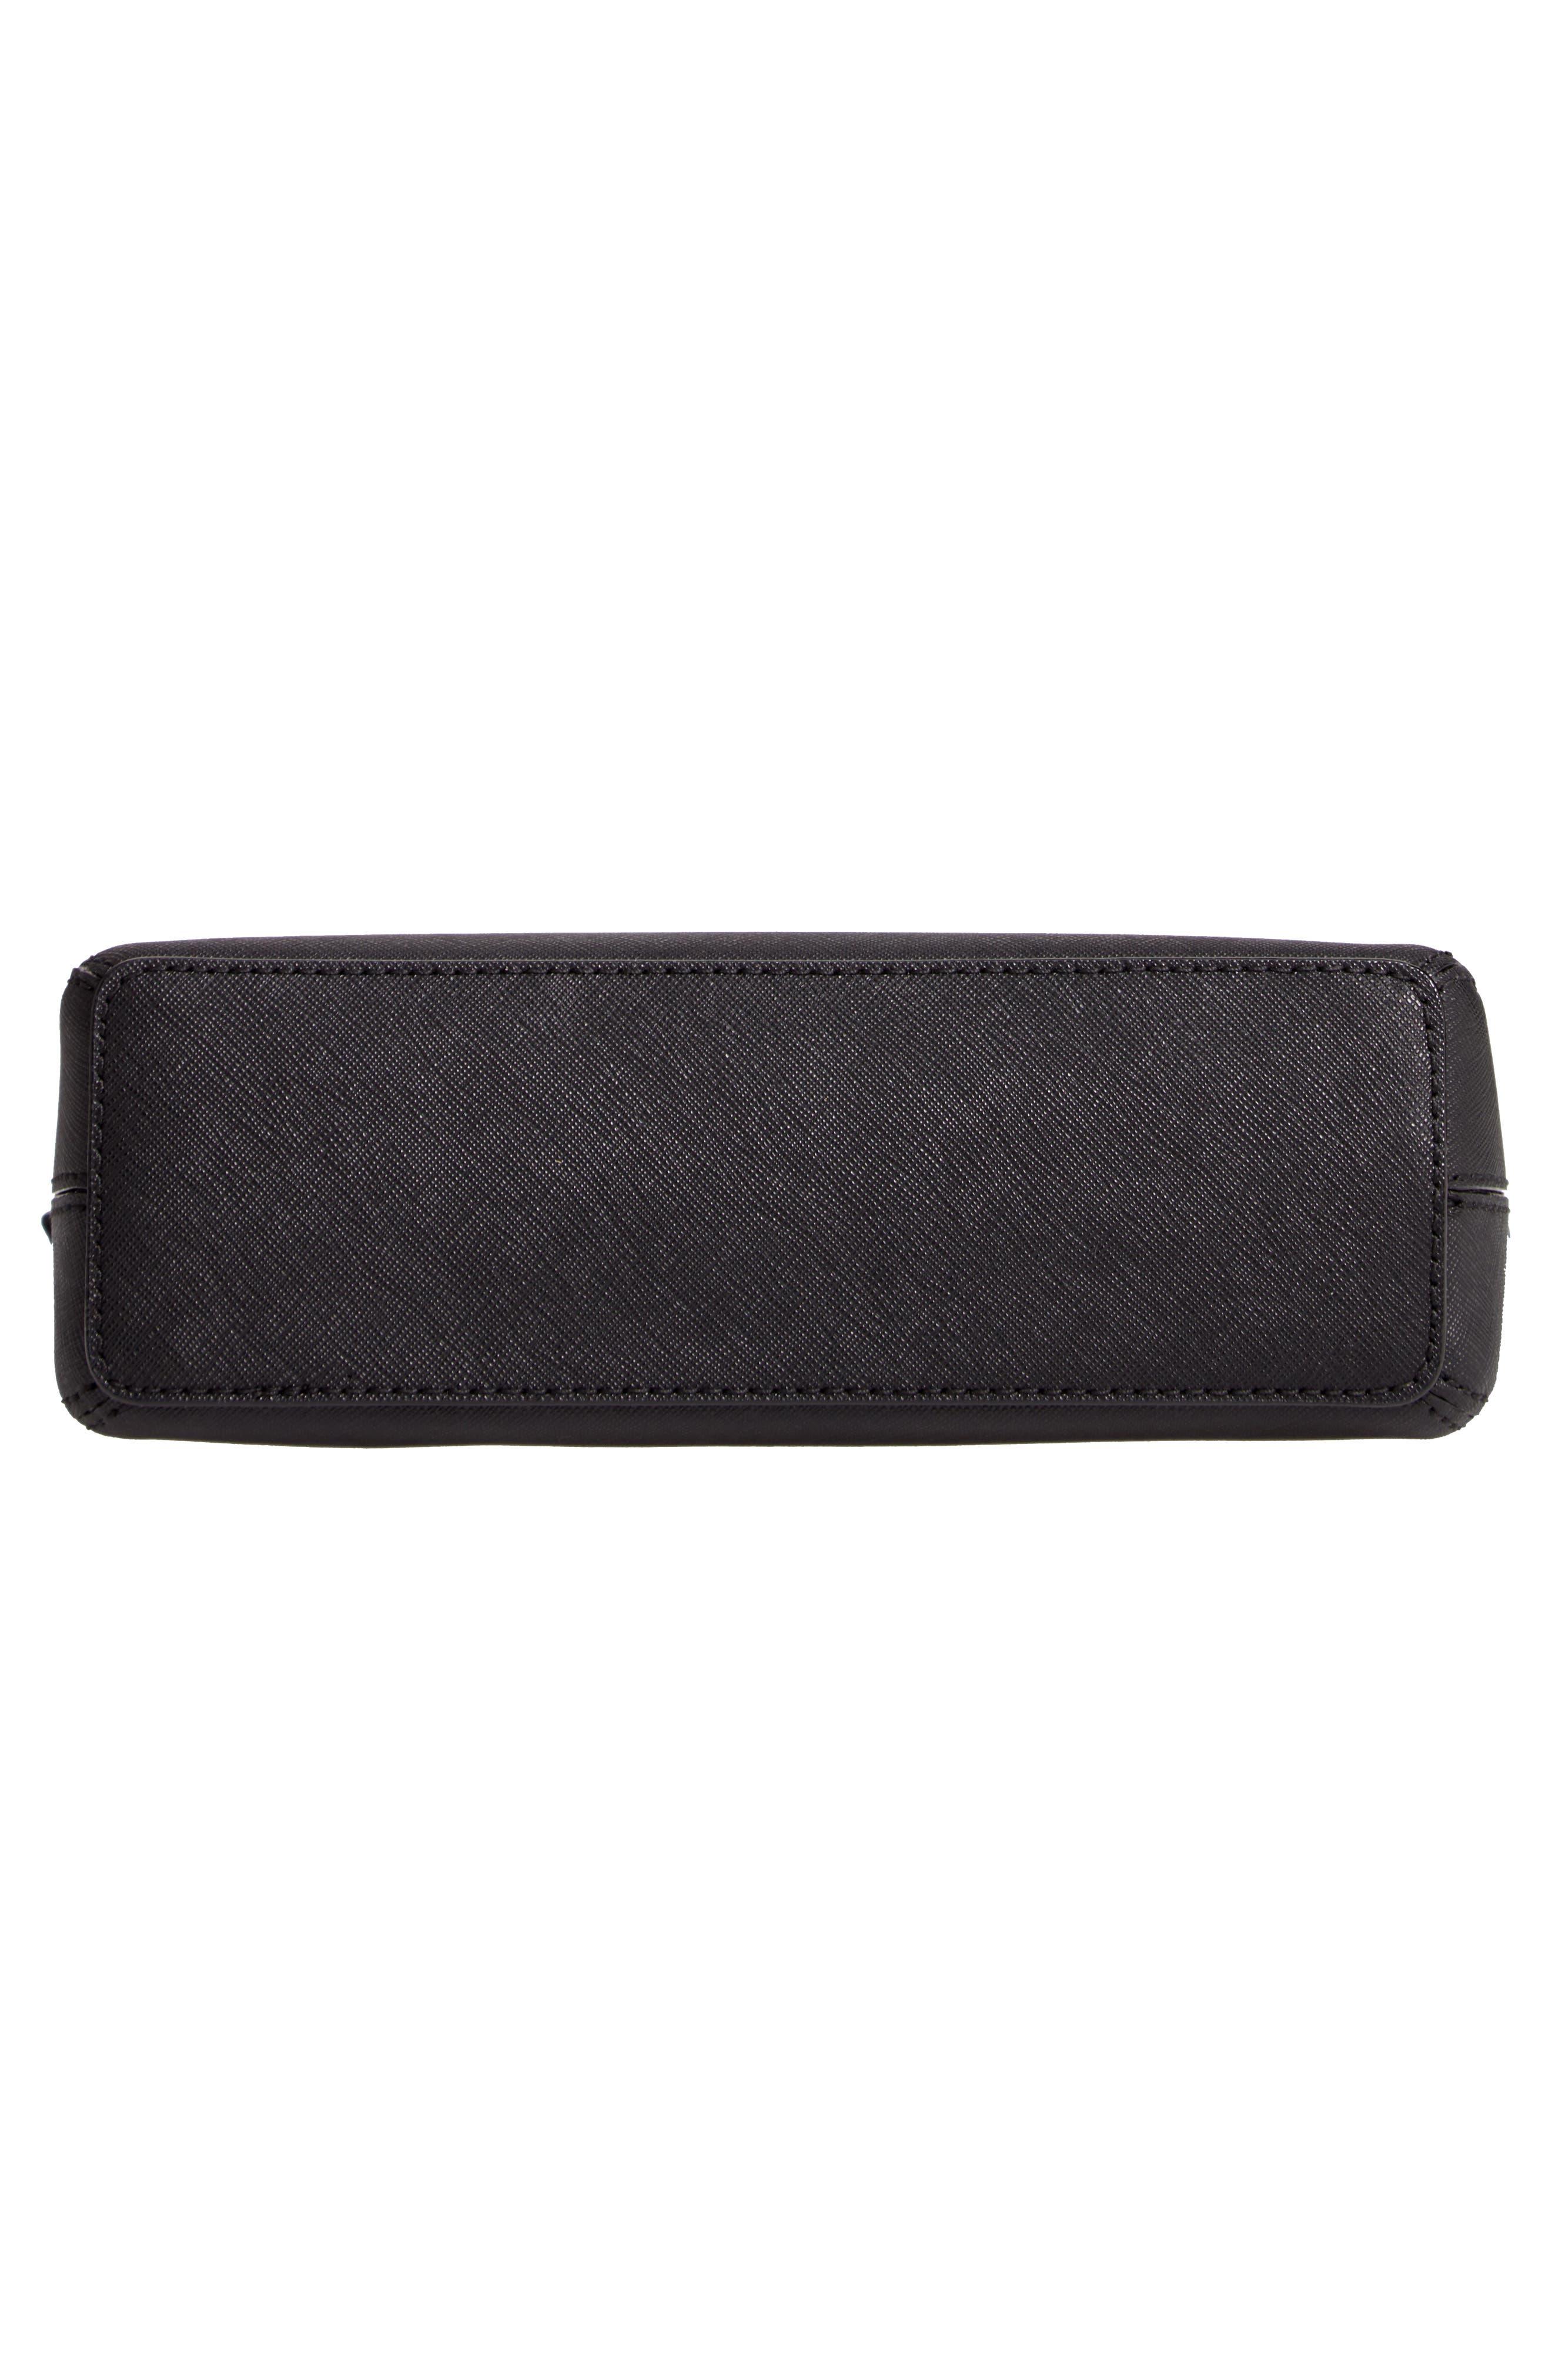 KATE SPADE NEW YORK, cameron street large hilli leather crossbody bag, Alternate thumbnail 6, color, 001